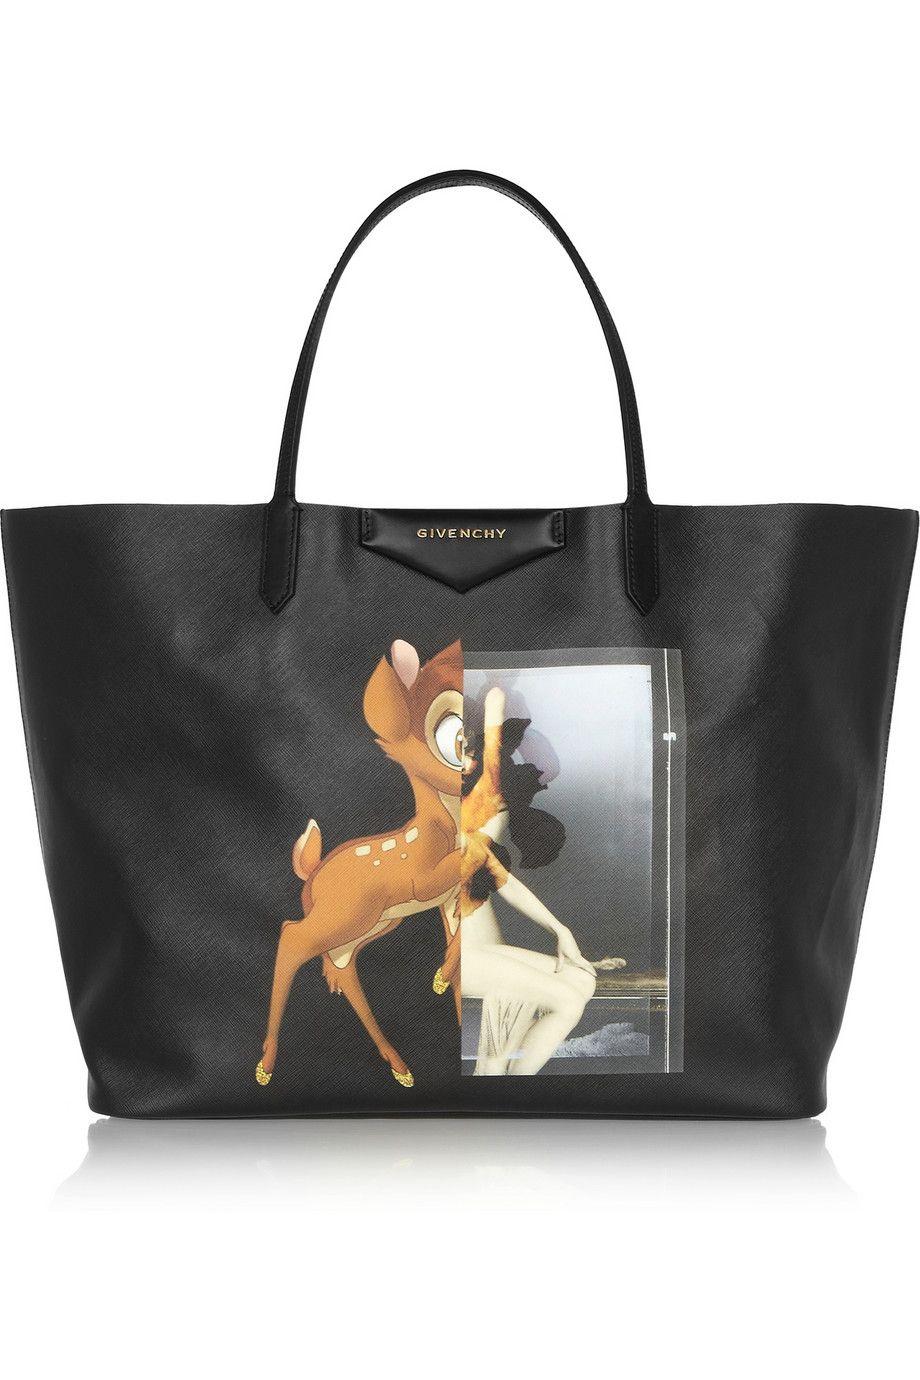 0a4a07fa9e Givenchy Antigona shopping bag in printed coated canvas USD 1192 ...